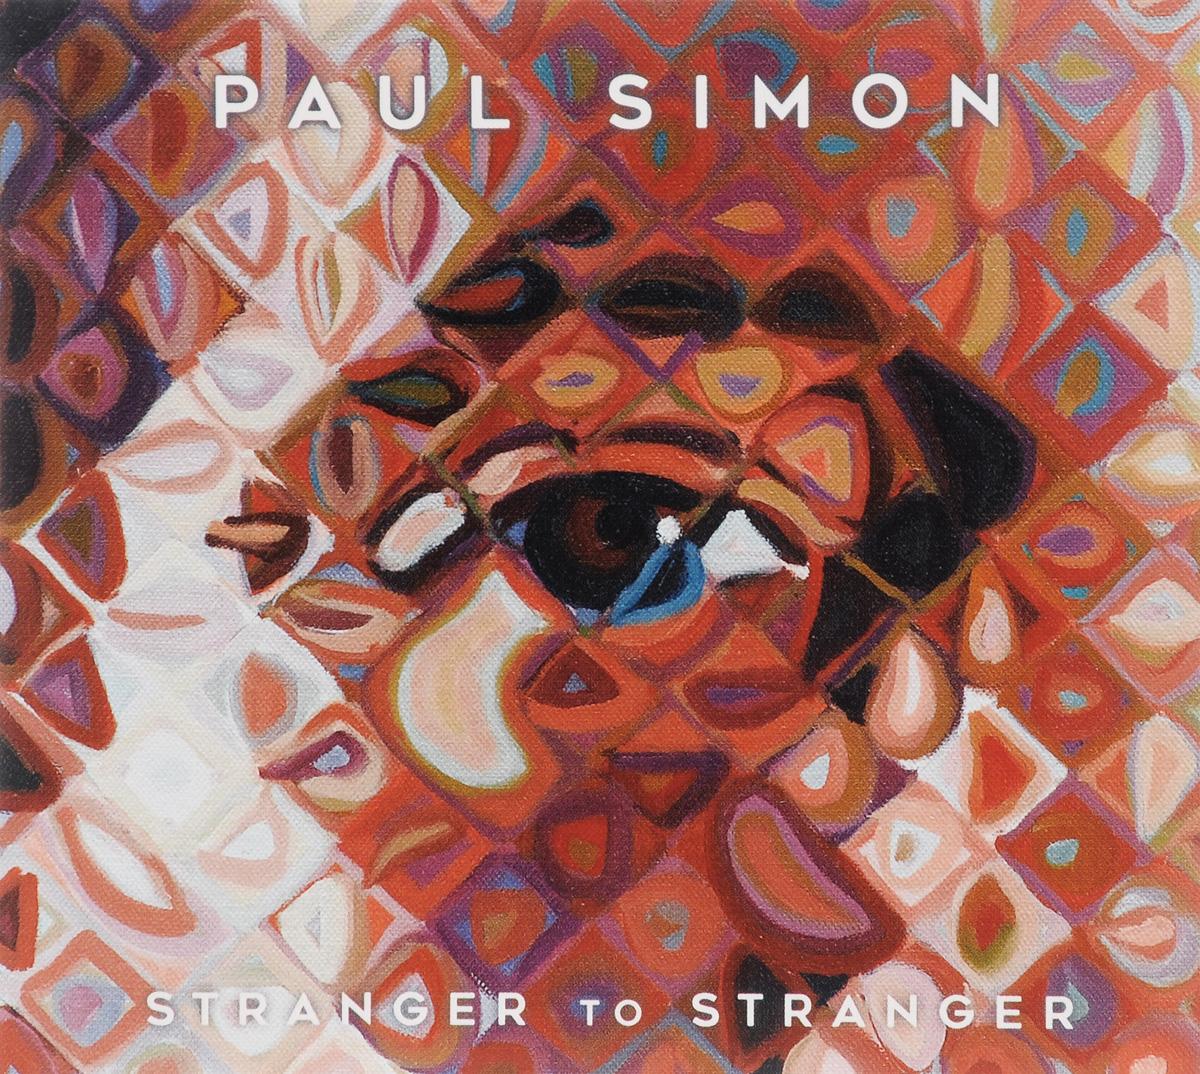 Пол Саймон Paul Simon. Stranger To Stranger (CD) саймон хелси мария тодтенхаупт йерг штродтофф berliner rundfunkchor simon halsey morgenlicht